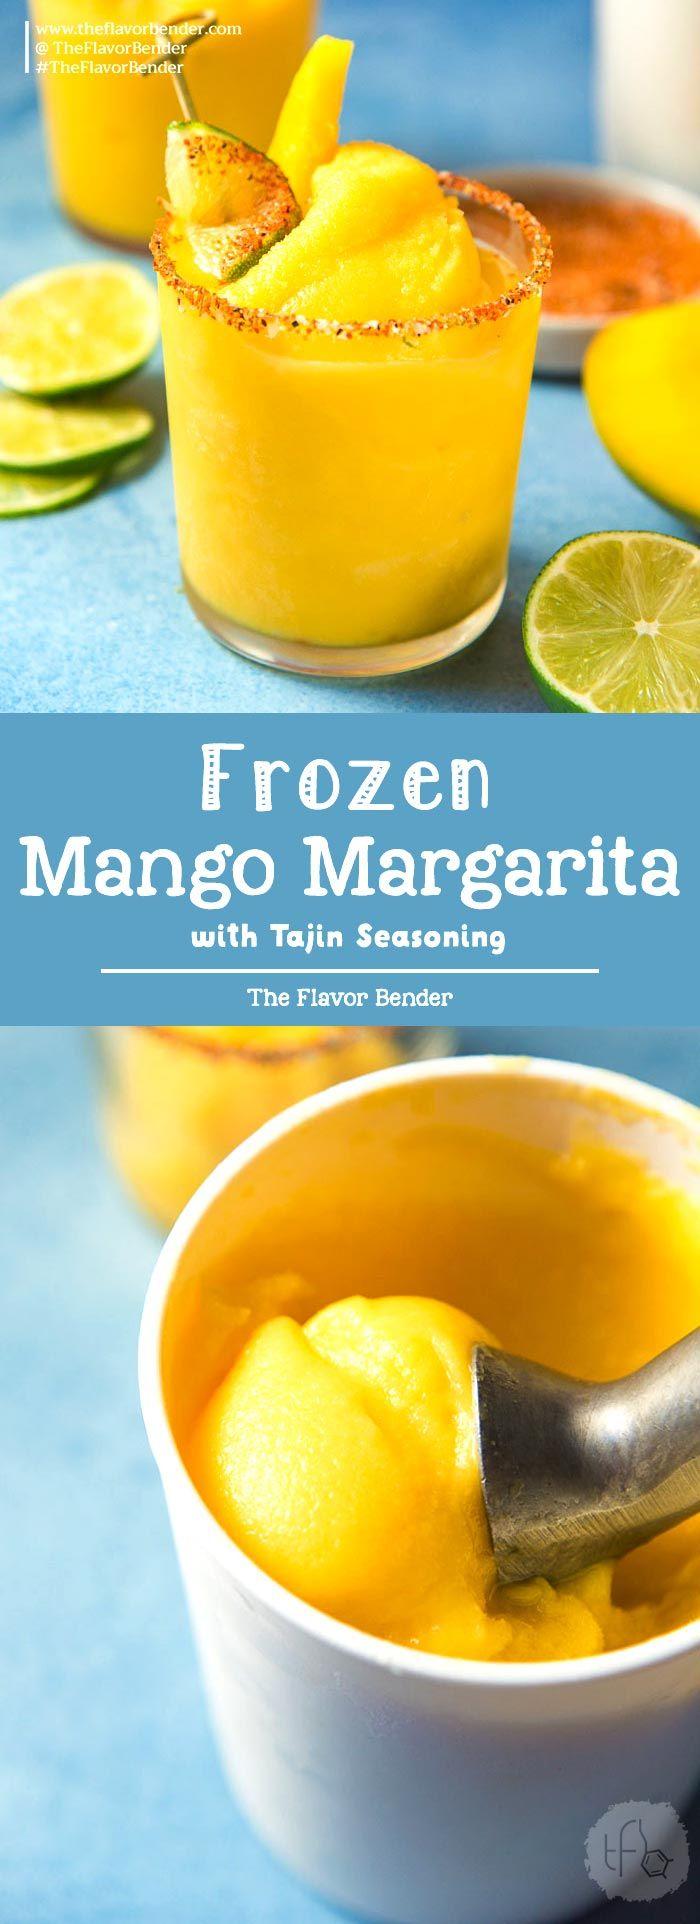 Frozen Mango Margarita -a creamy, sorbet like, fruity and refreshing frozen margarita with a spicy lime chili salt ring (Tajin Seasoning) to kick it up another notch! #MangoMargarita #FrozenMargarita #SummerCocktails via @theflavorbender #frozenmargaritarecipes